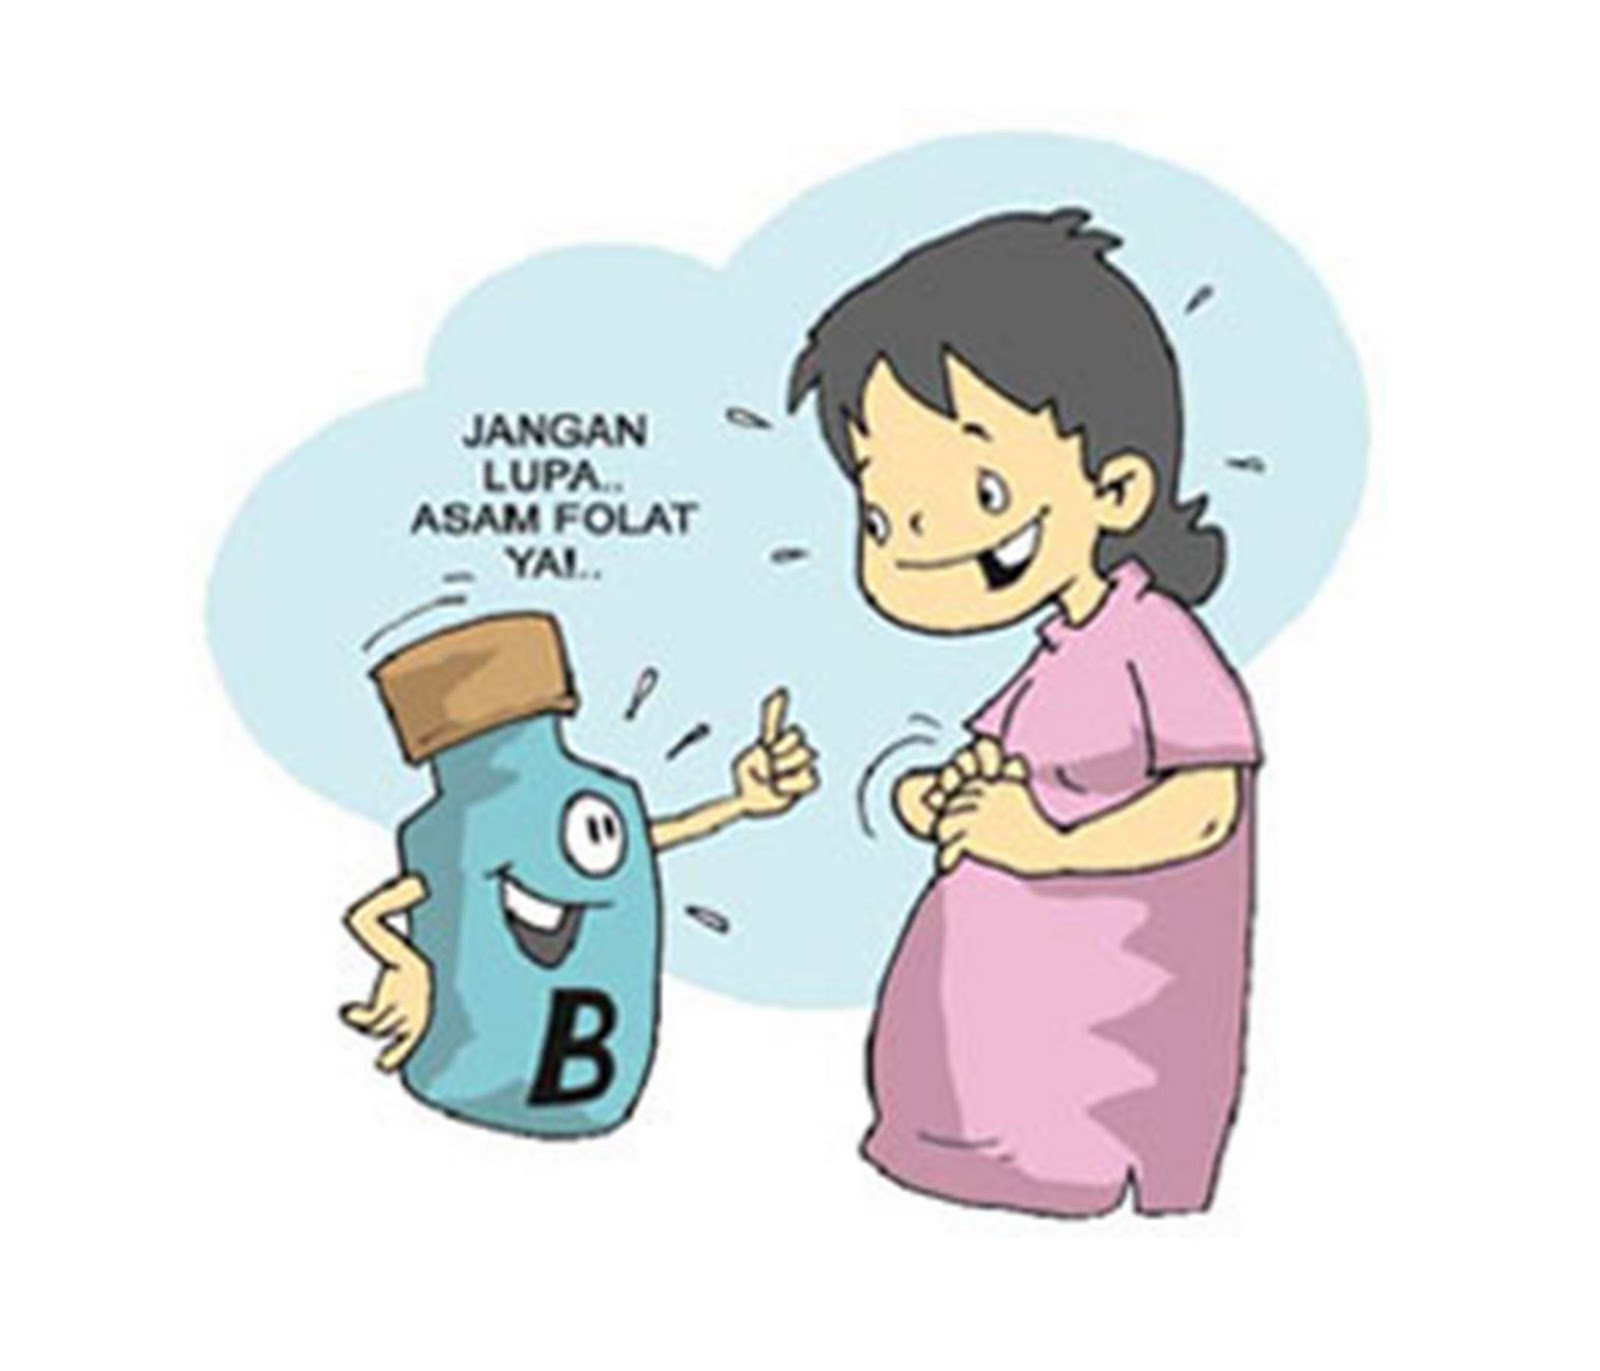 Animasi Kartun Ibu Hamil Gambar Kartun